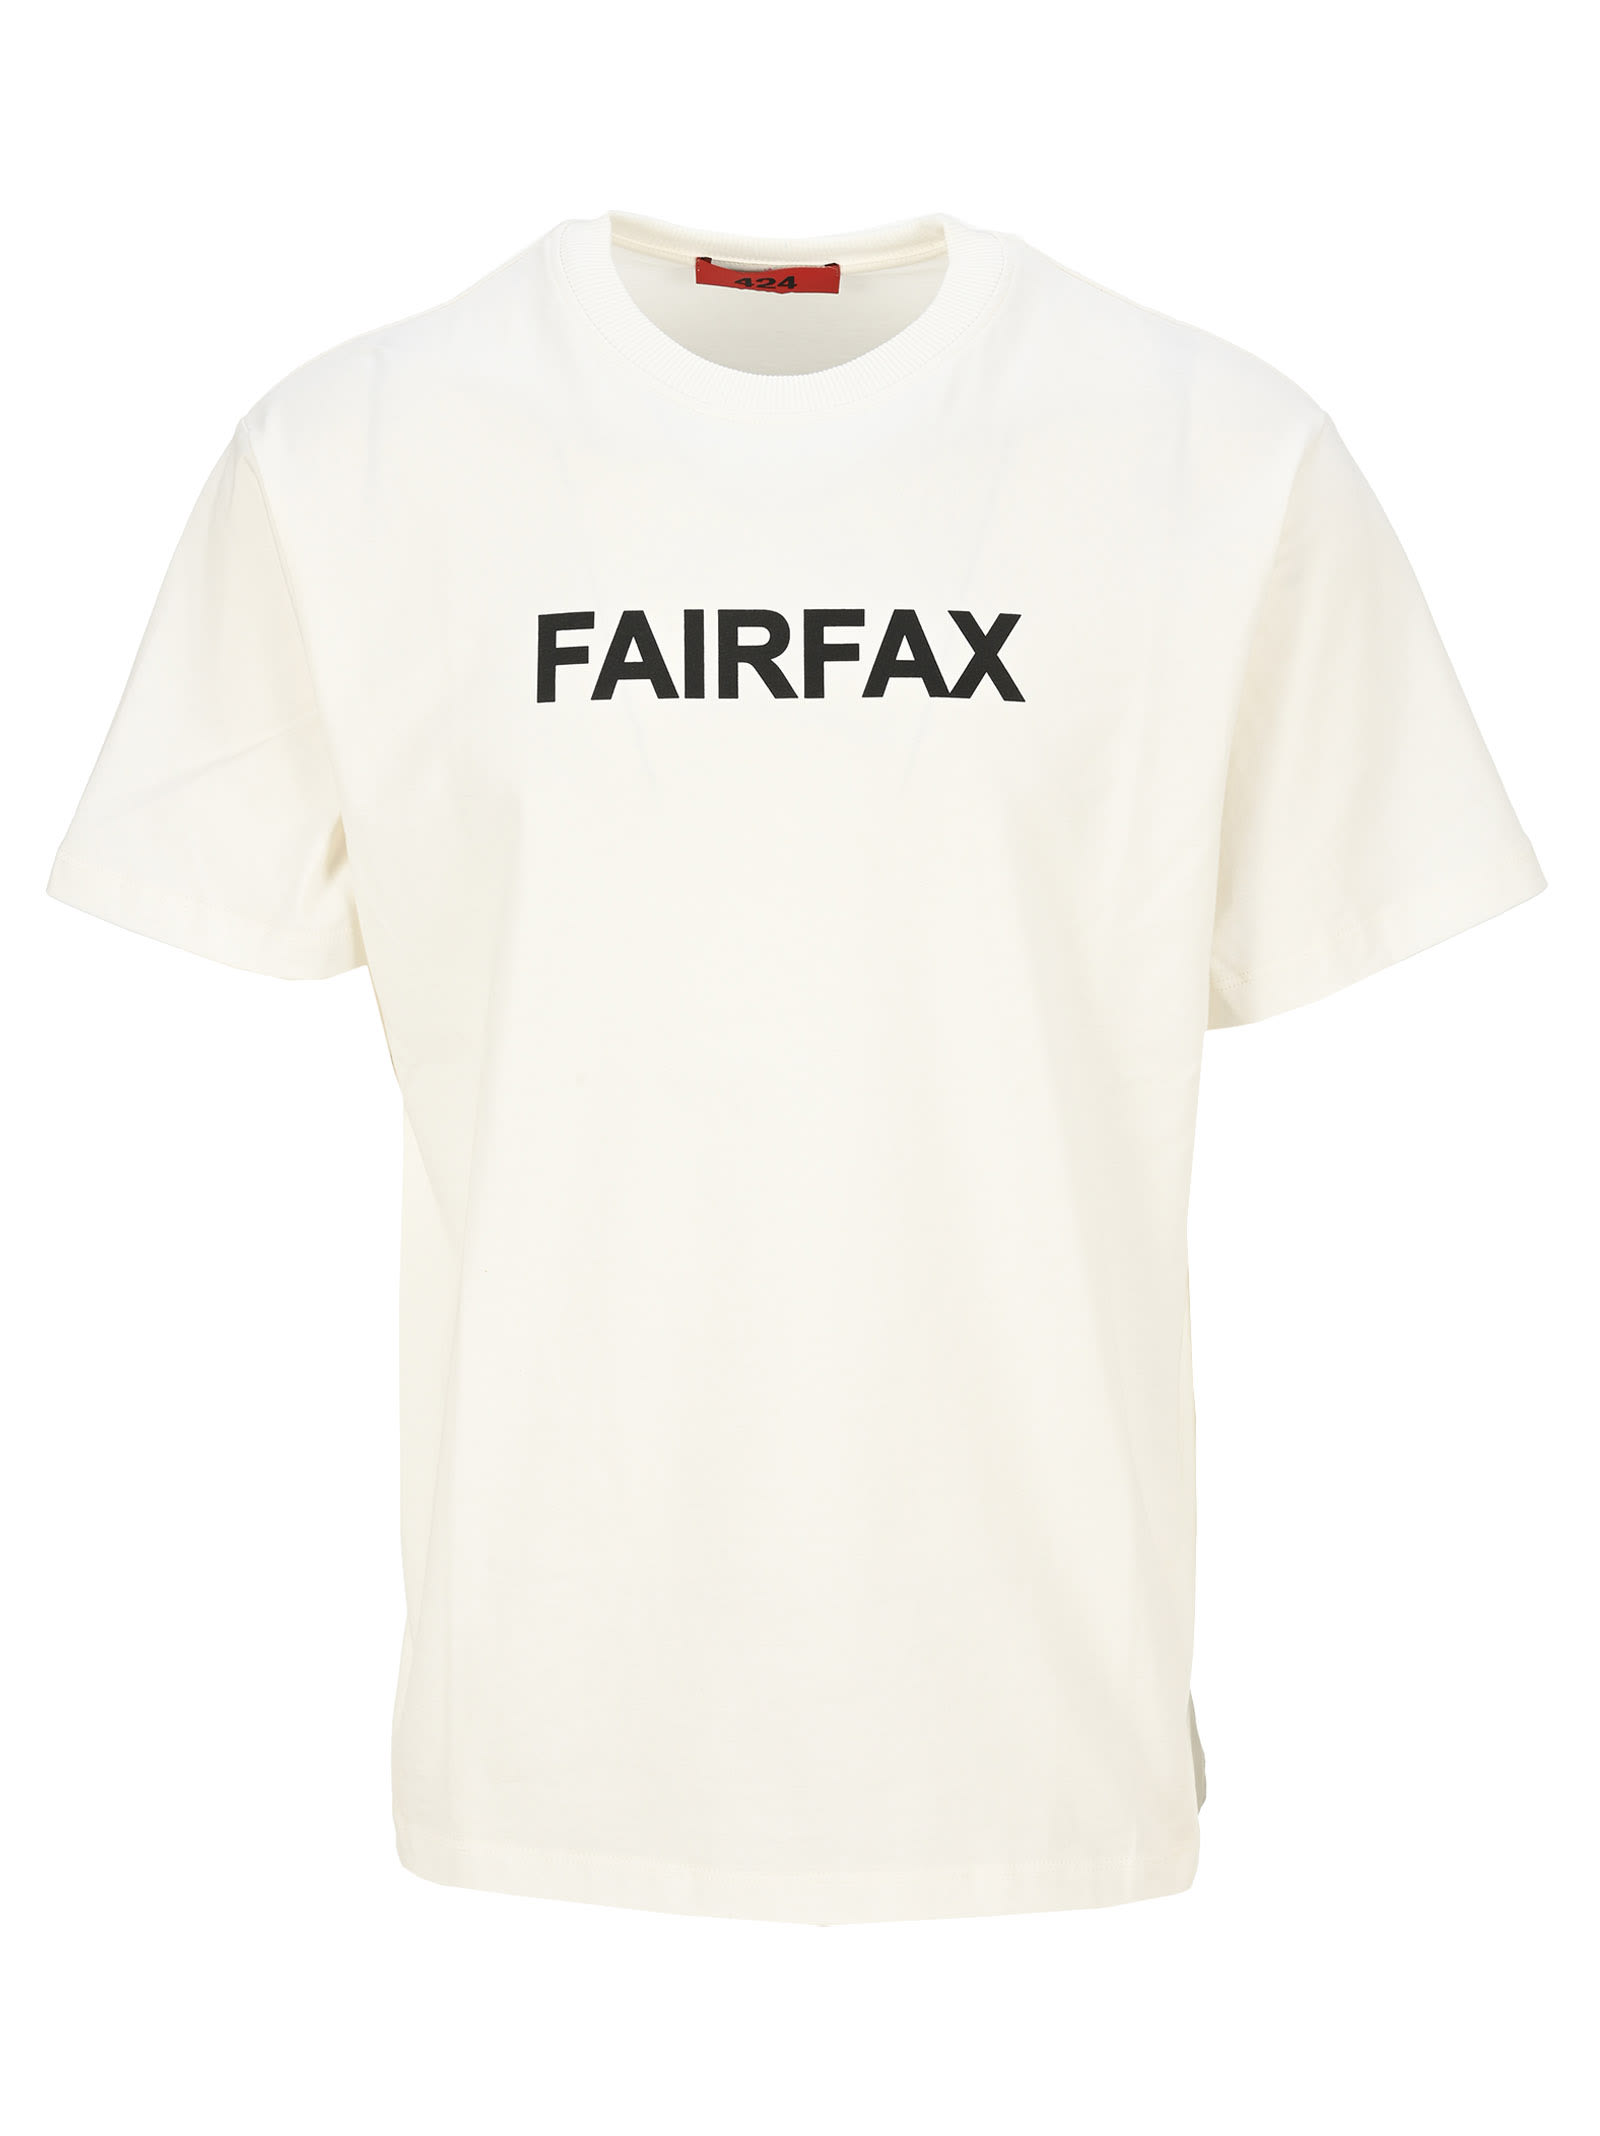 424 Fairfax T-shirt